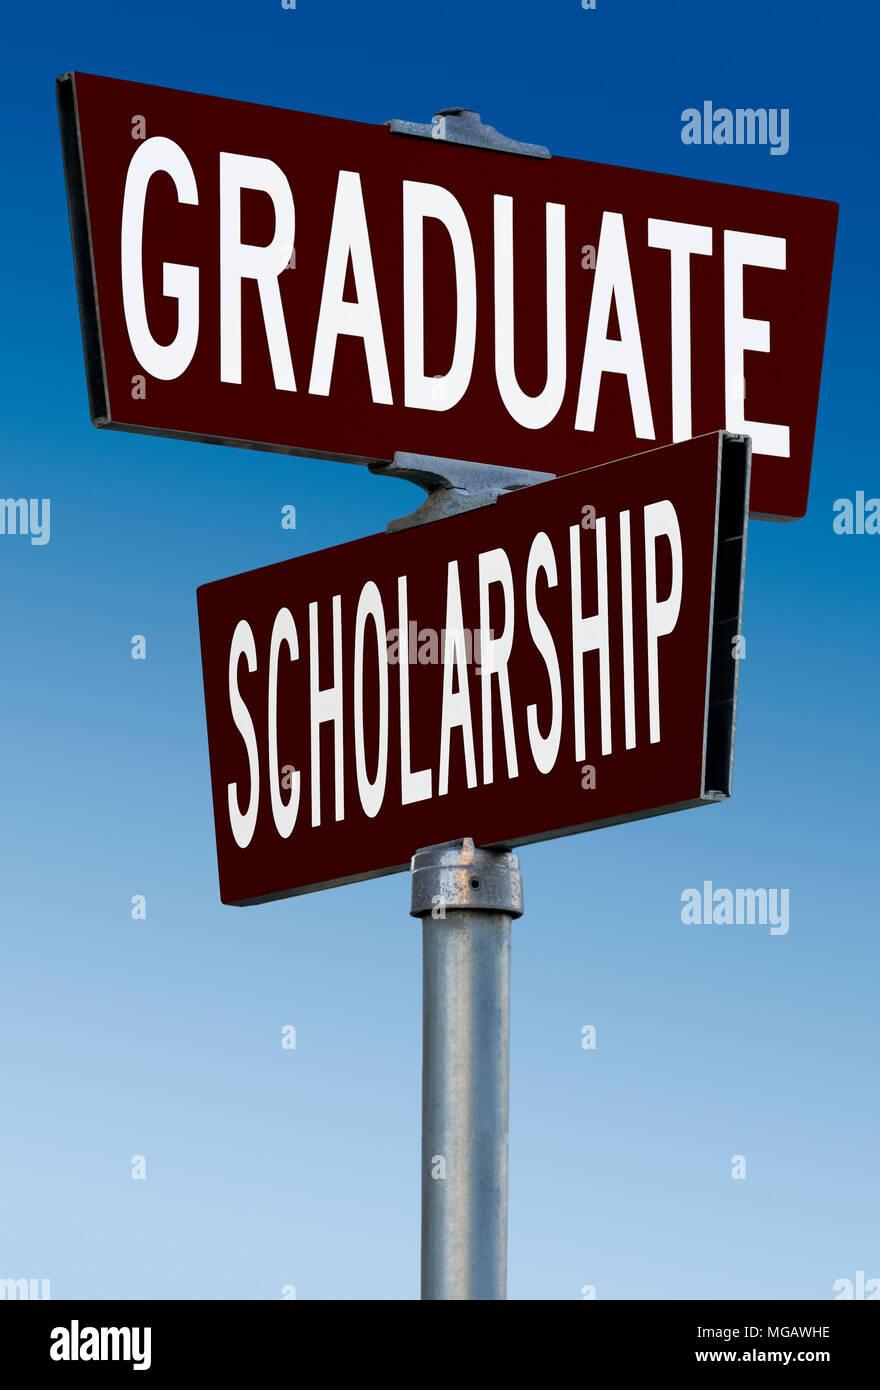 Academic signpost: Graduate and Scholarship - Stock Image